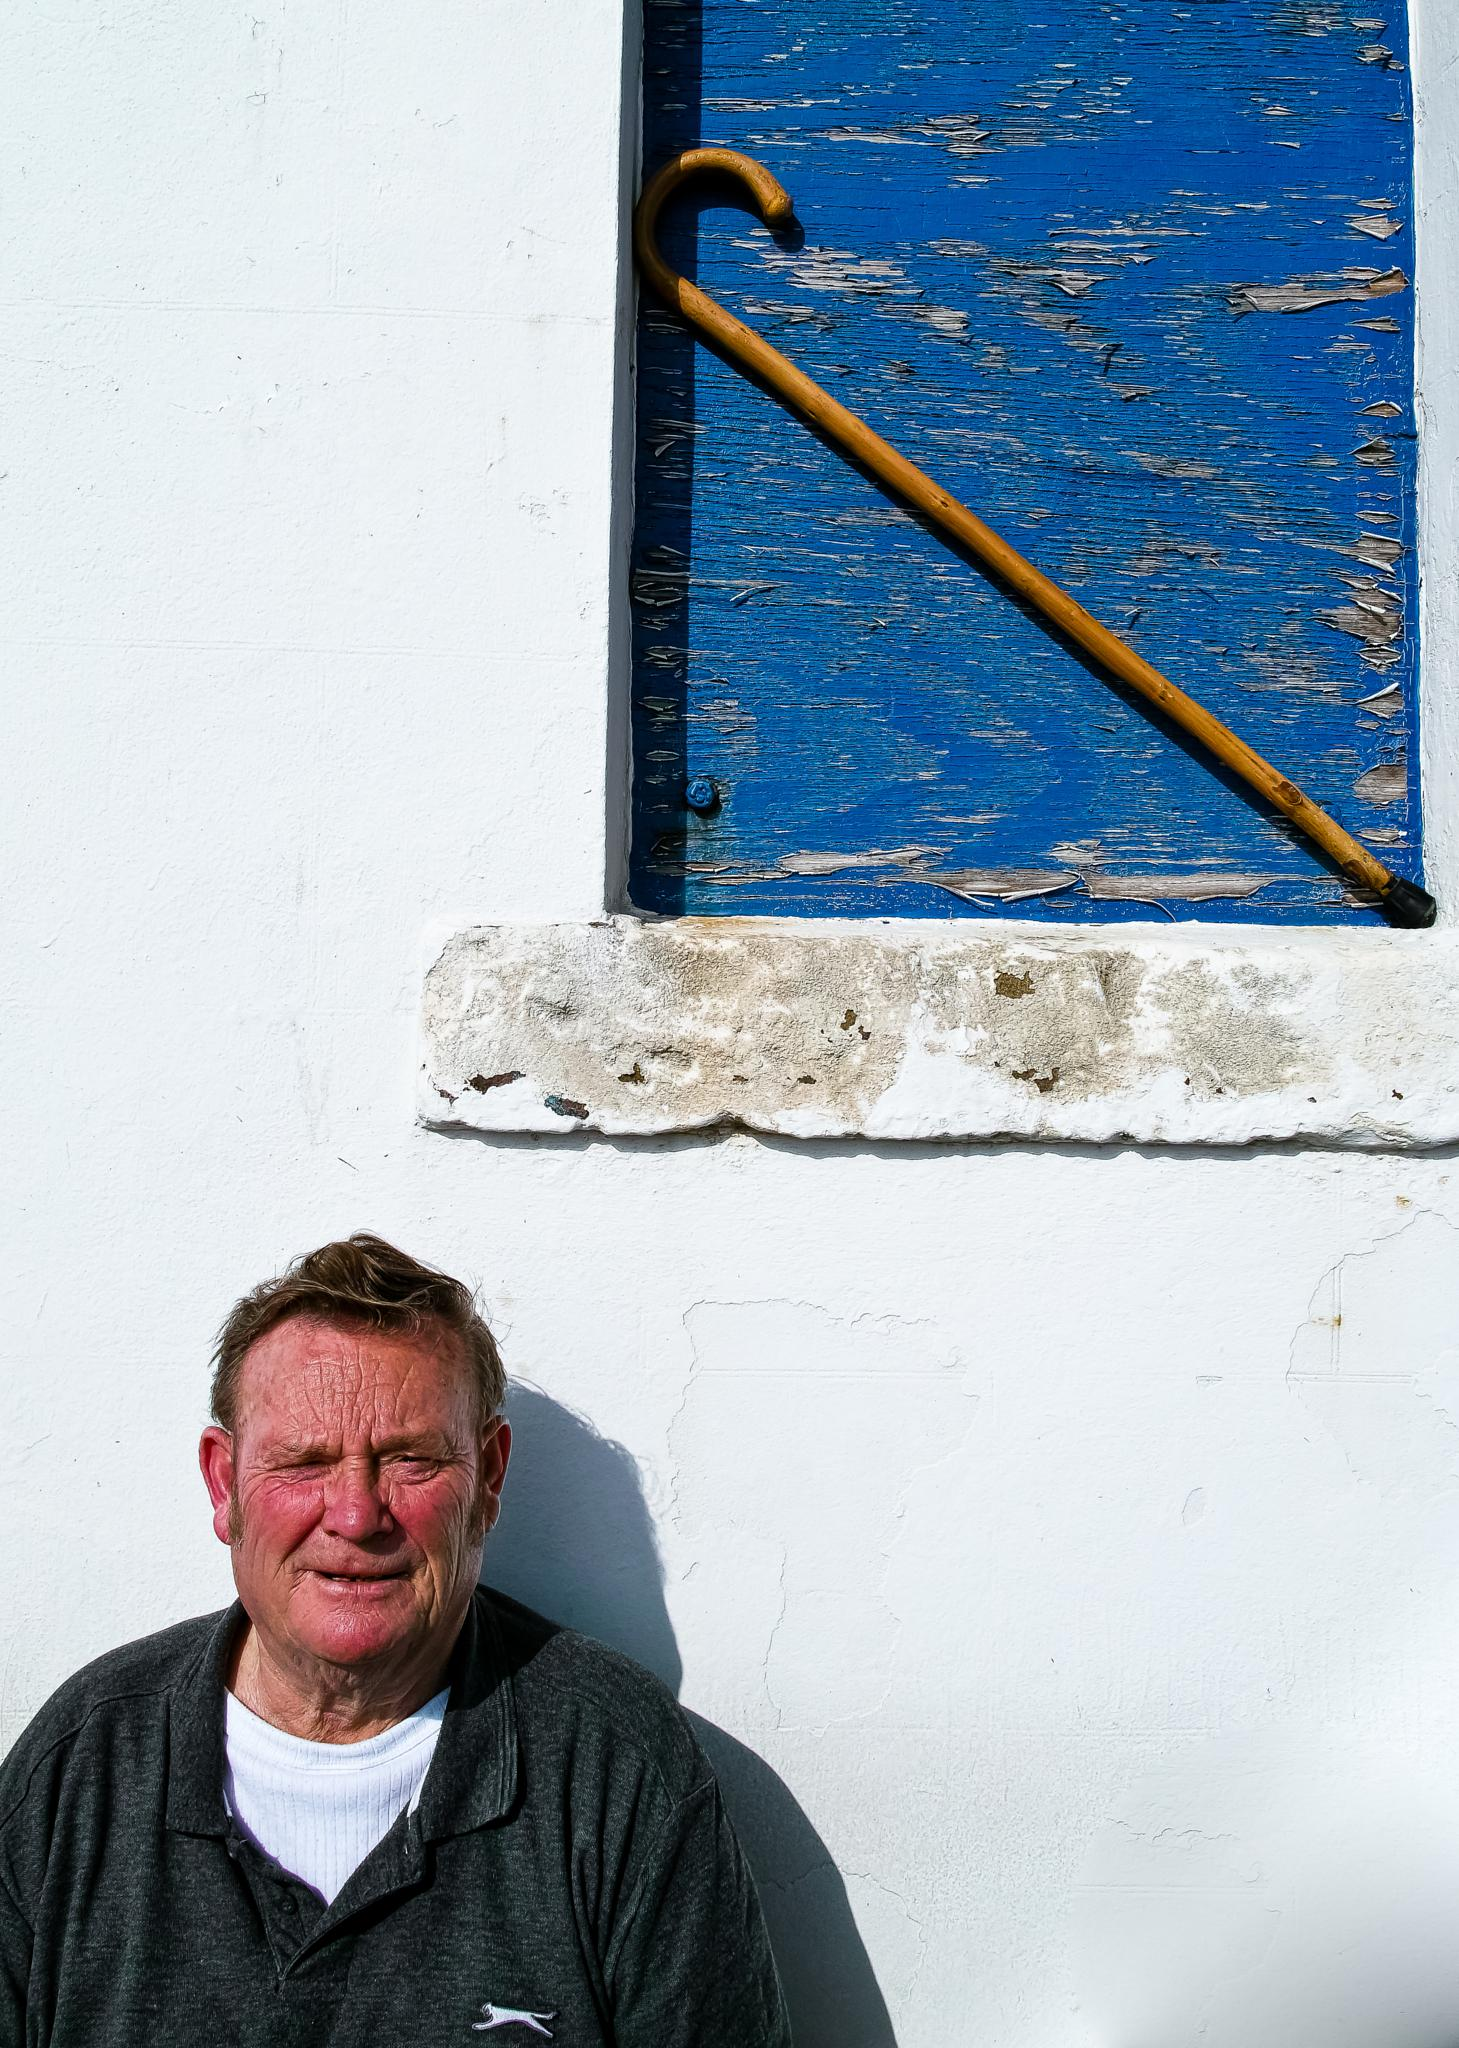 Old man & his walking stick by Peter Edwardo Vicente.